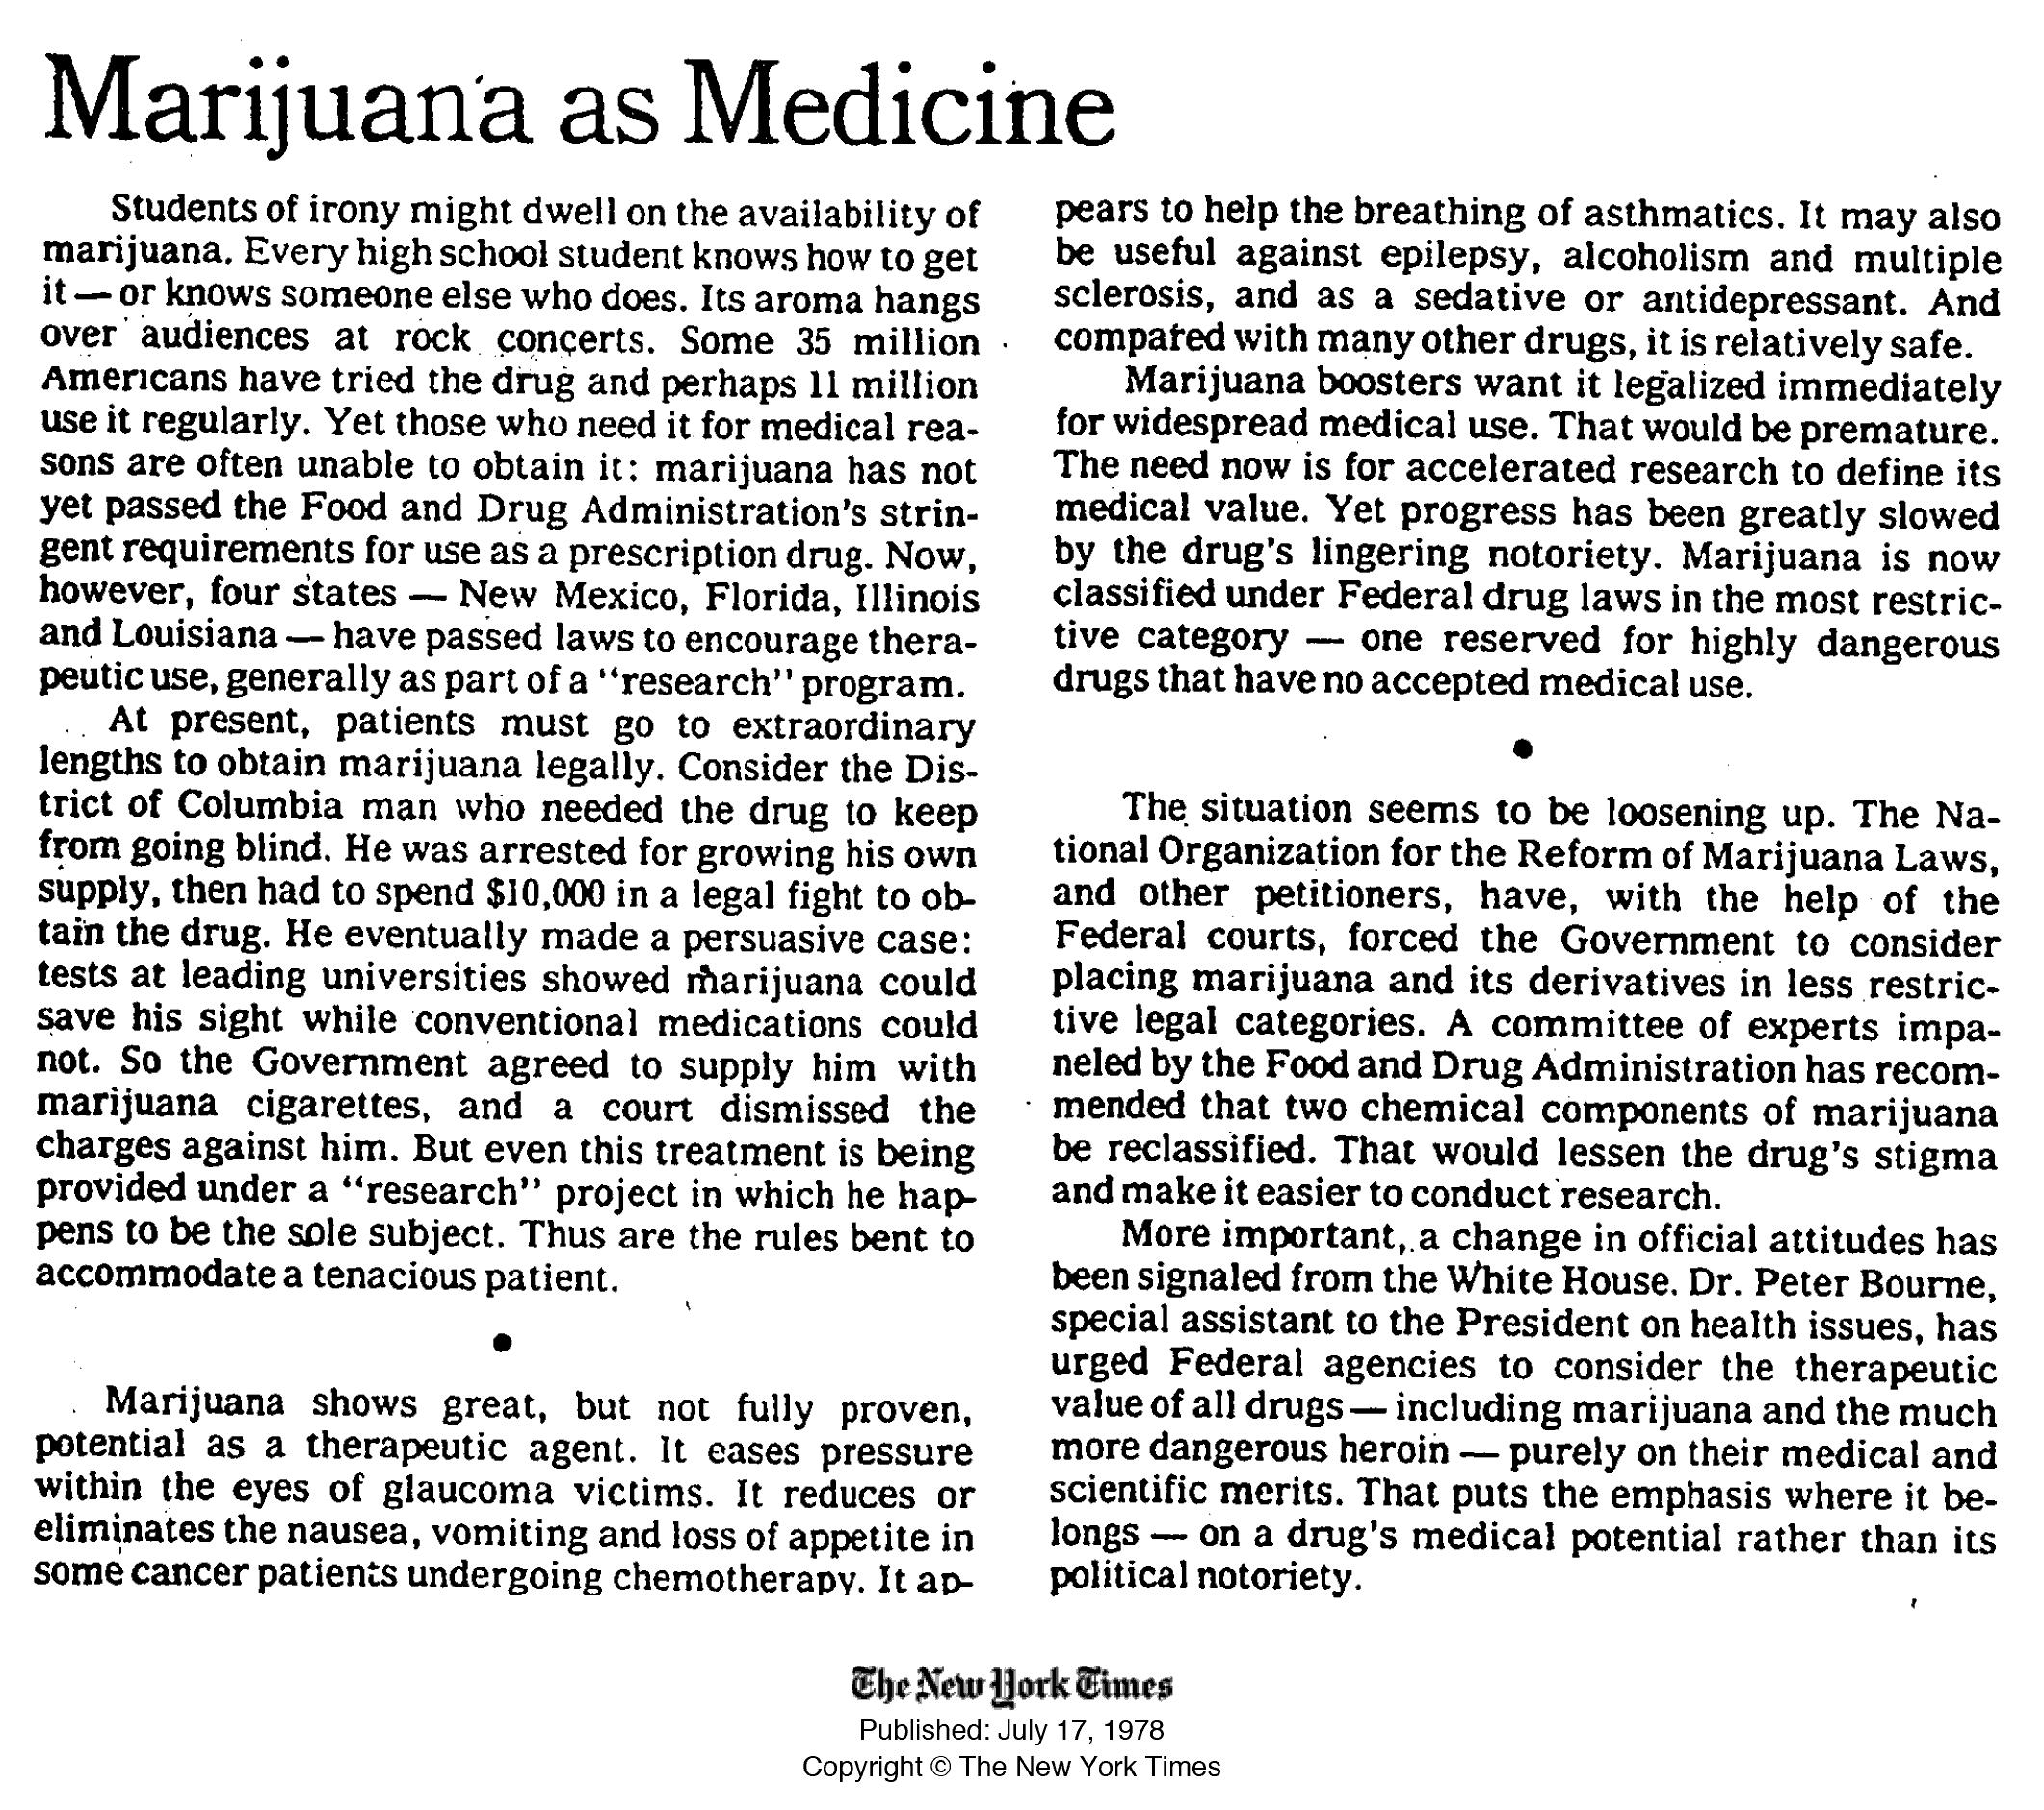 002 Why Marijuanas Should Illegal Essay Frightening Be Medical Argumentative Full